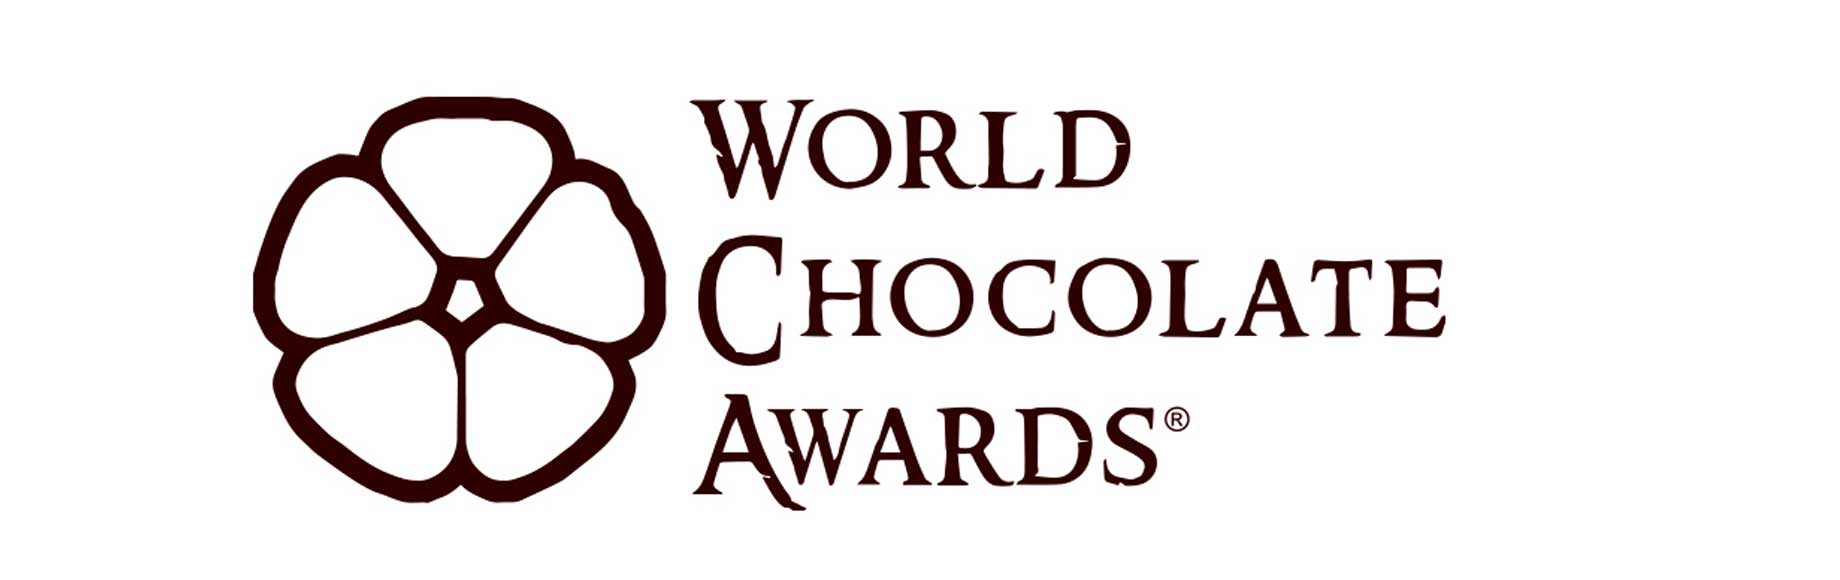 World-Chocolate-Awards-Caoni-Winner.jpg